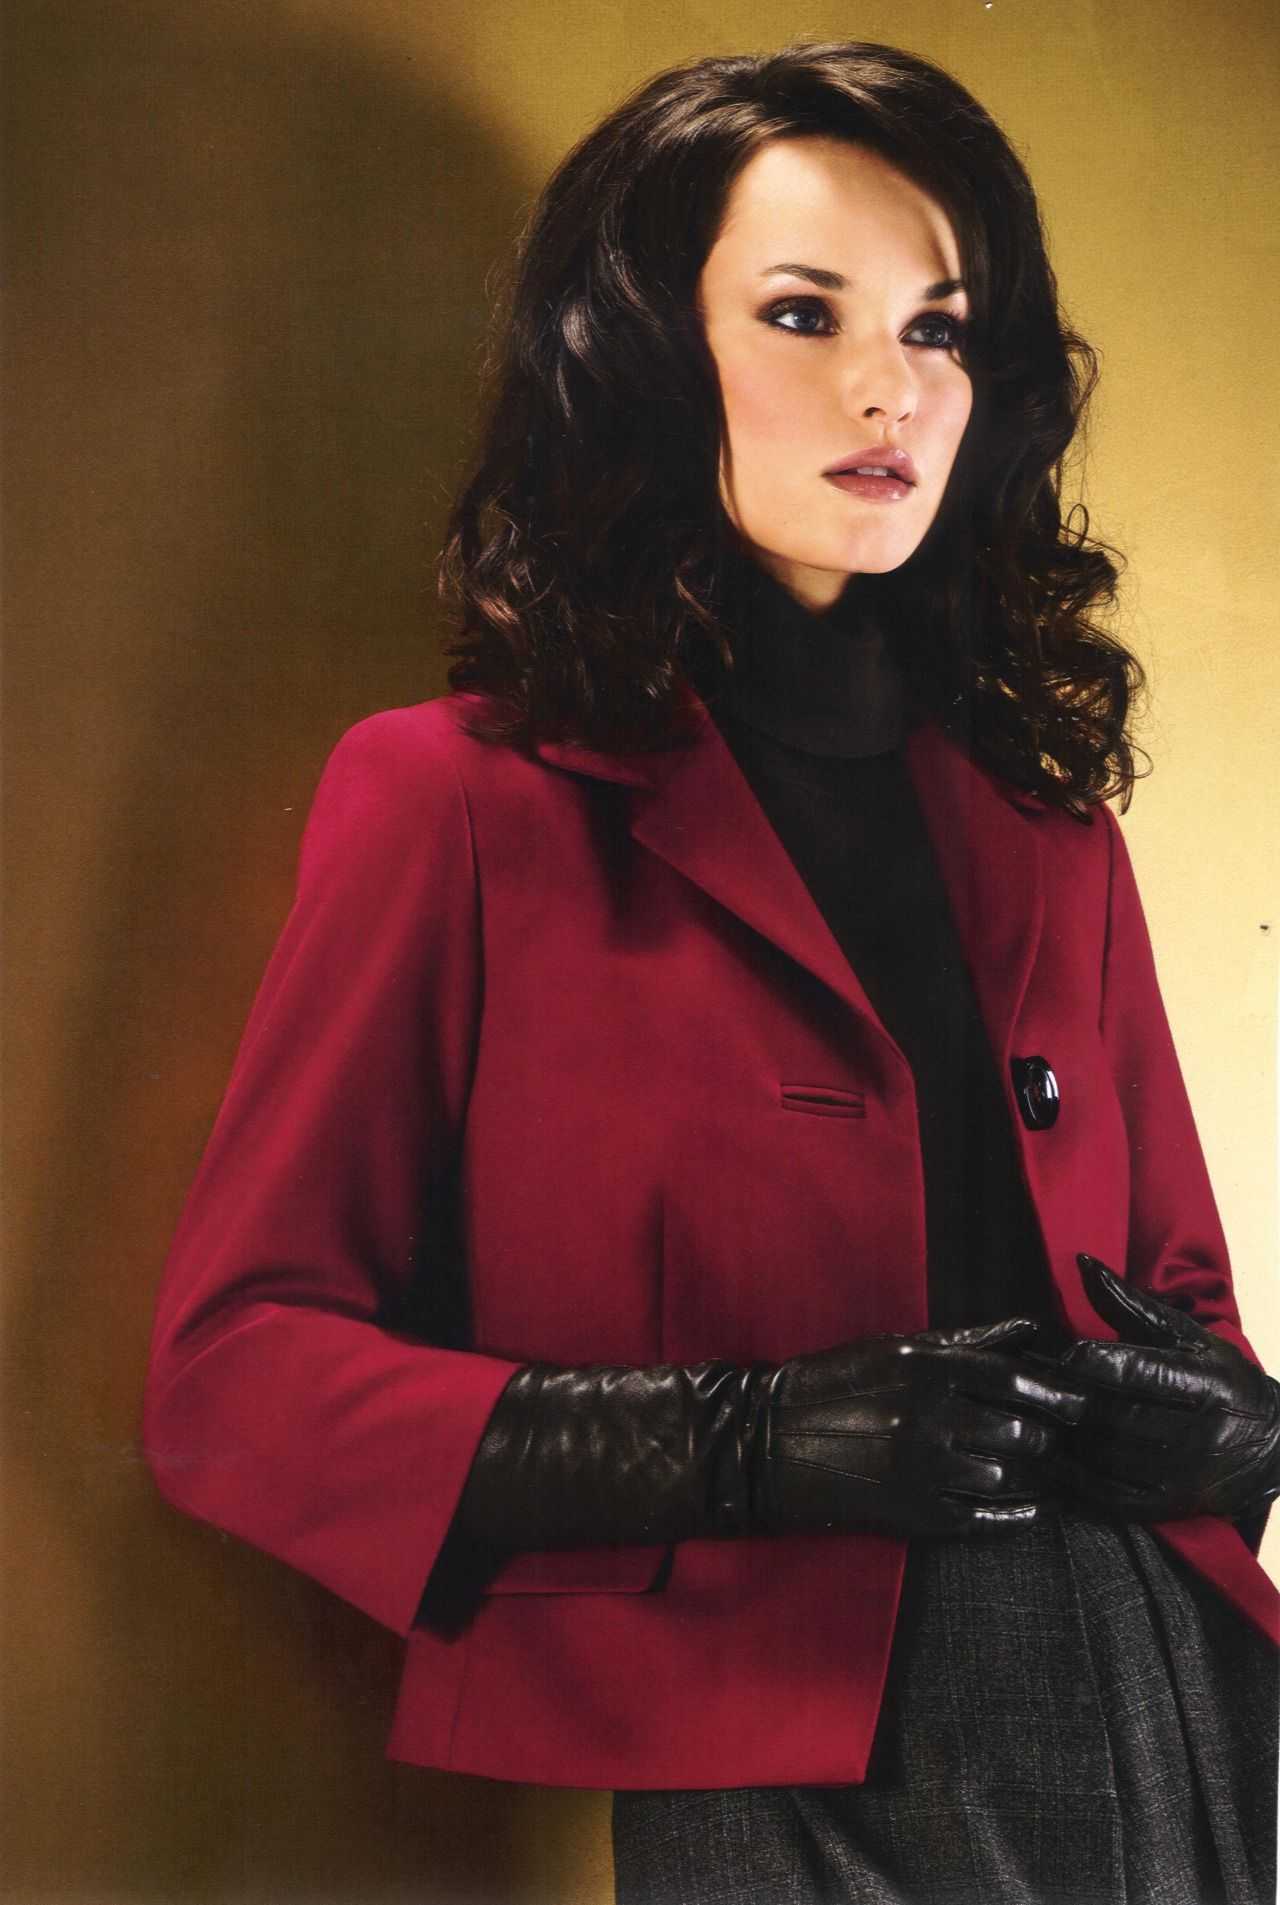 Gloves/Latex/Kink | leather glove | Pinterest | Gloves ...